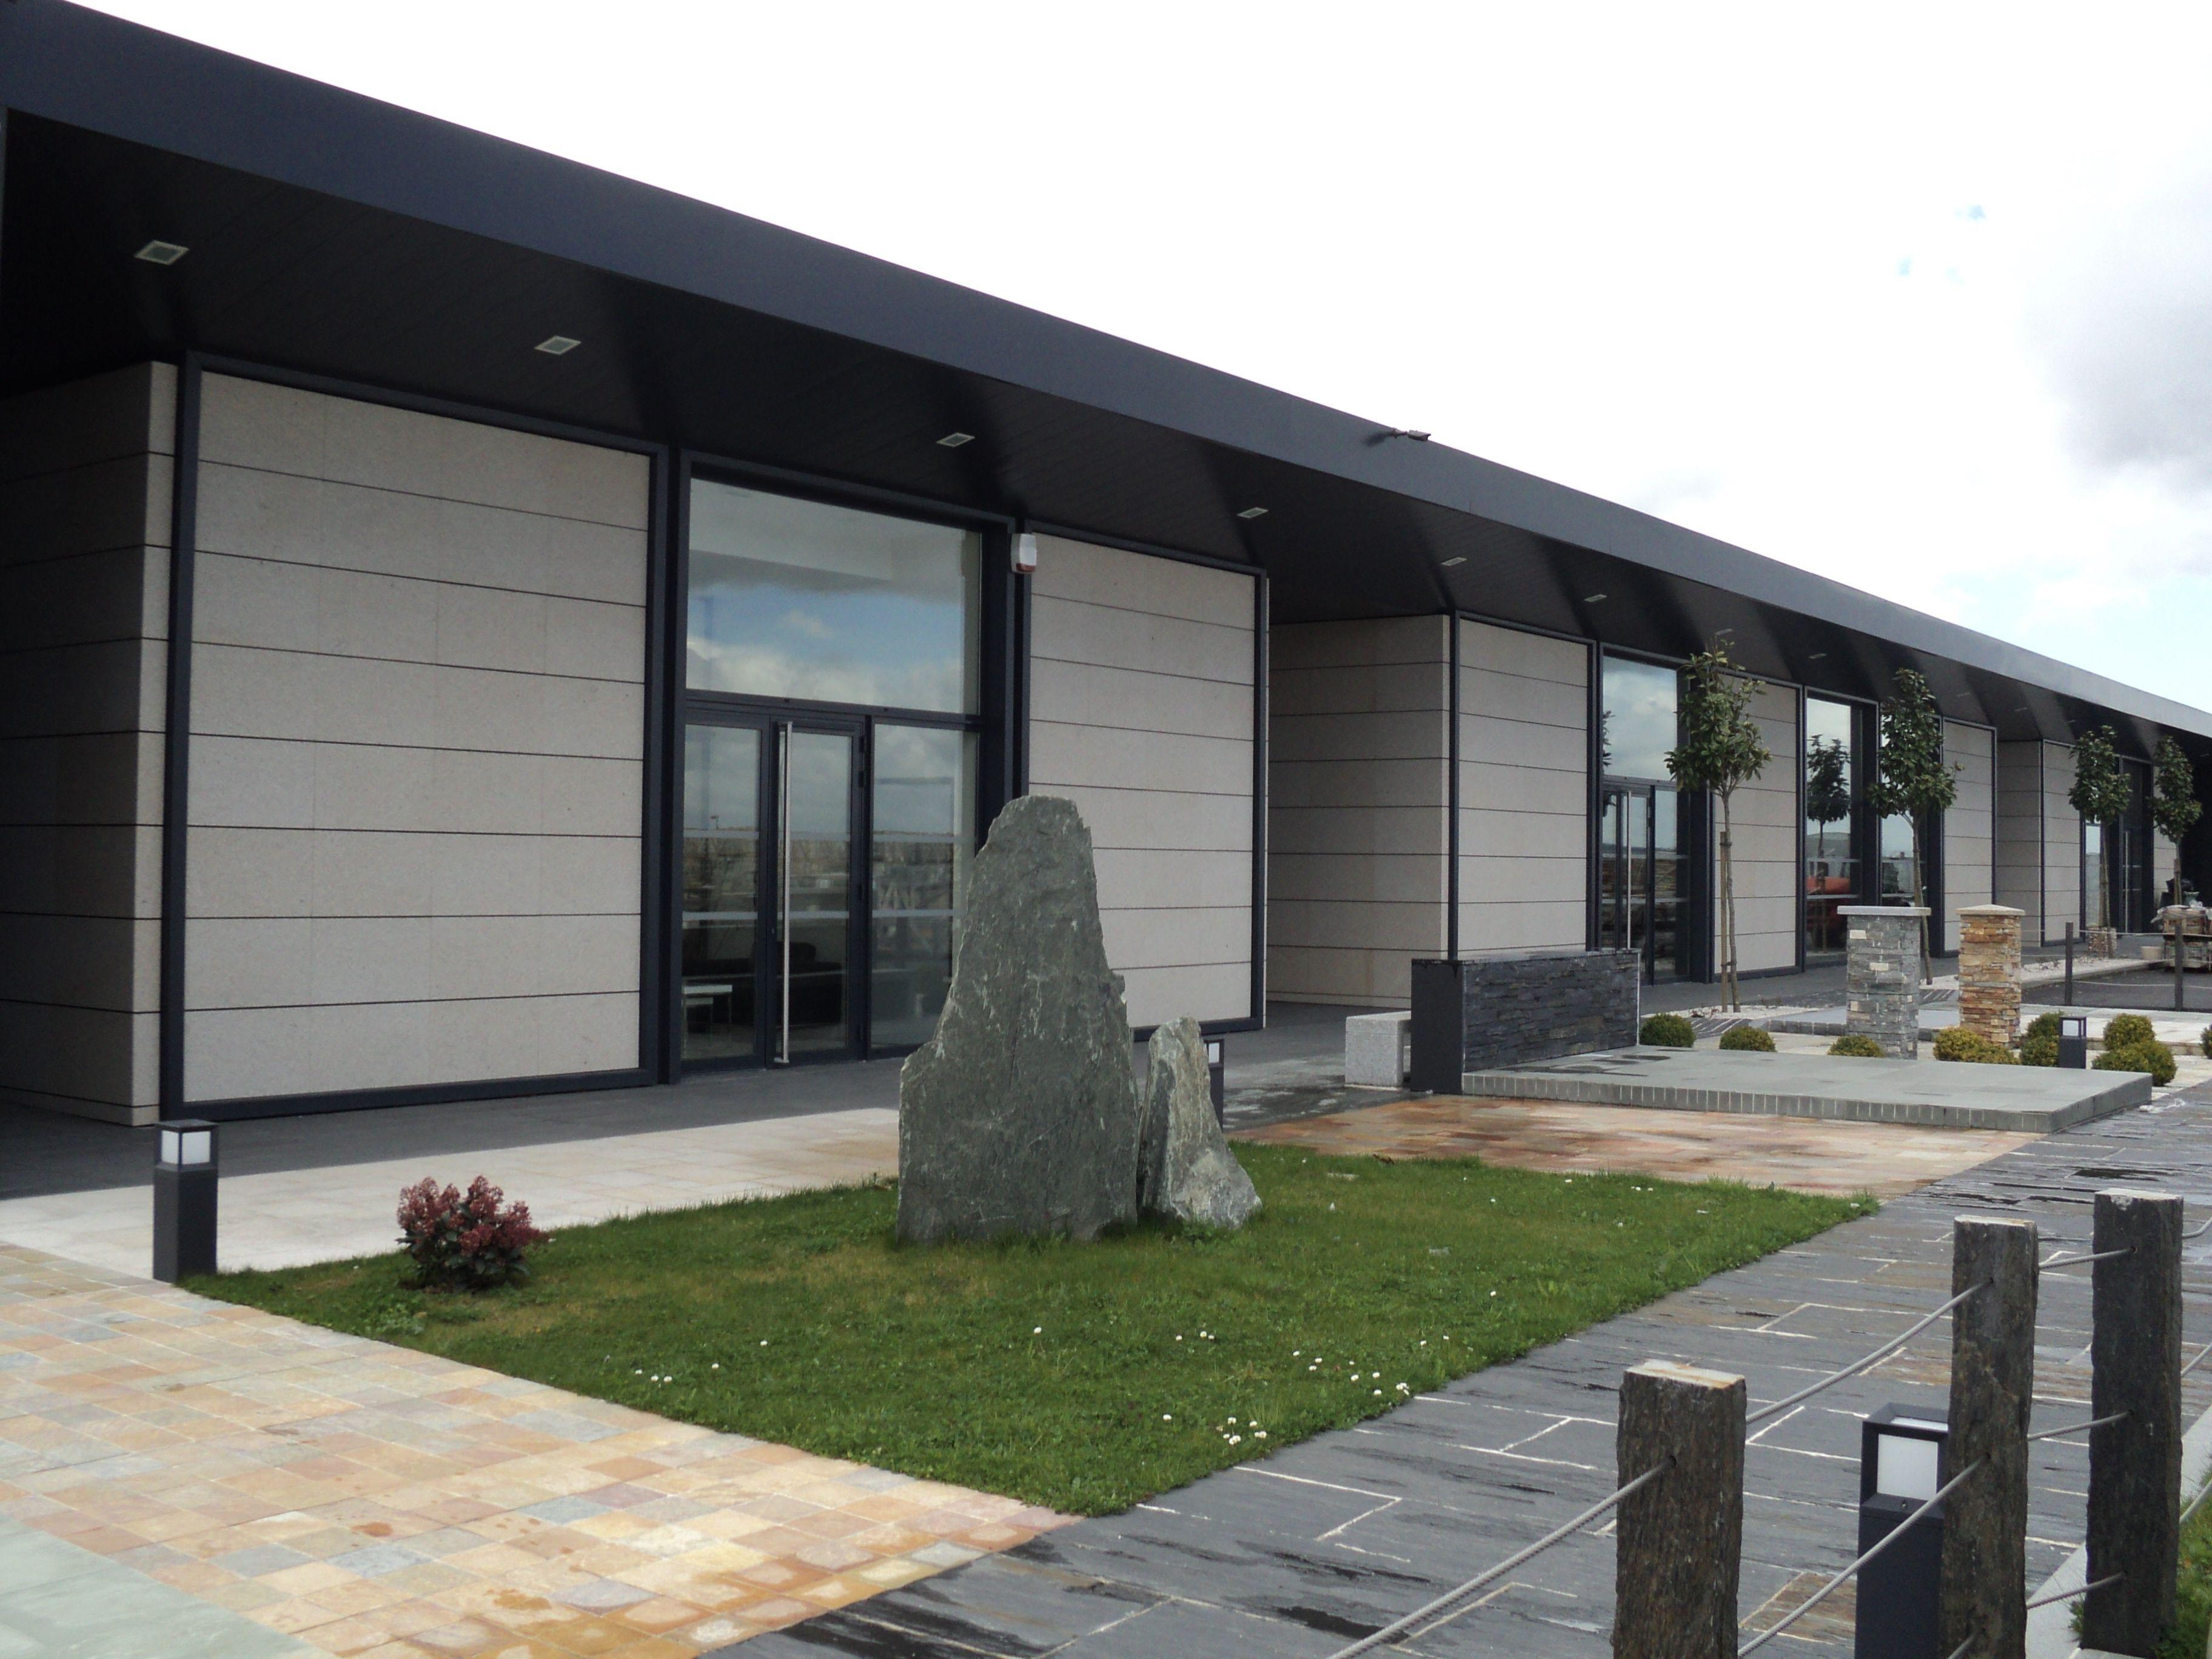 Architecte limoges xxme sicle hd wallpapers maison architecte limoges architecte d interieur - Architecte d interieur rouen ...